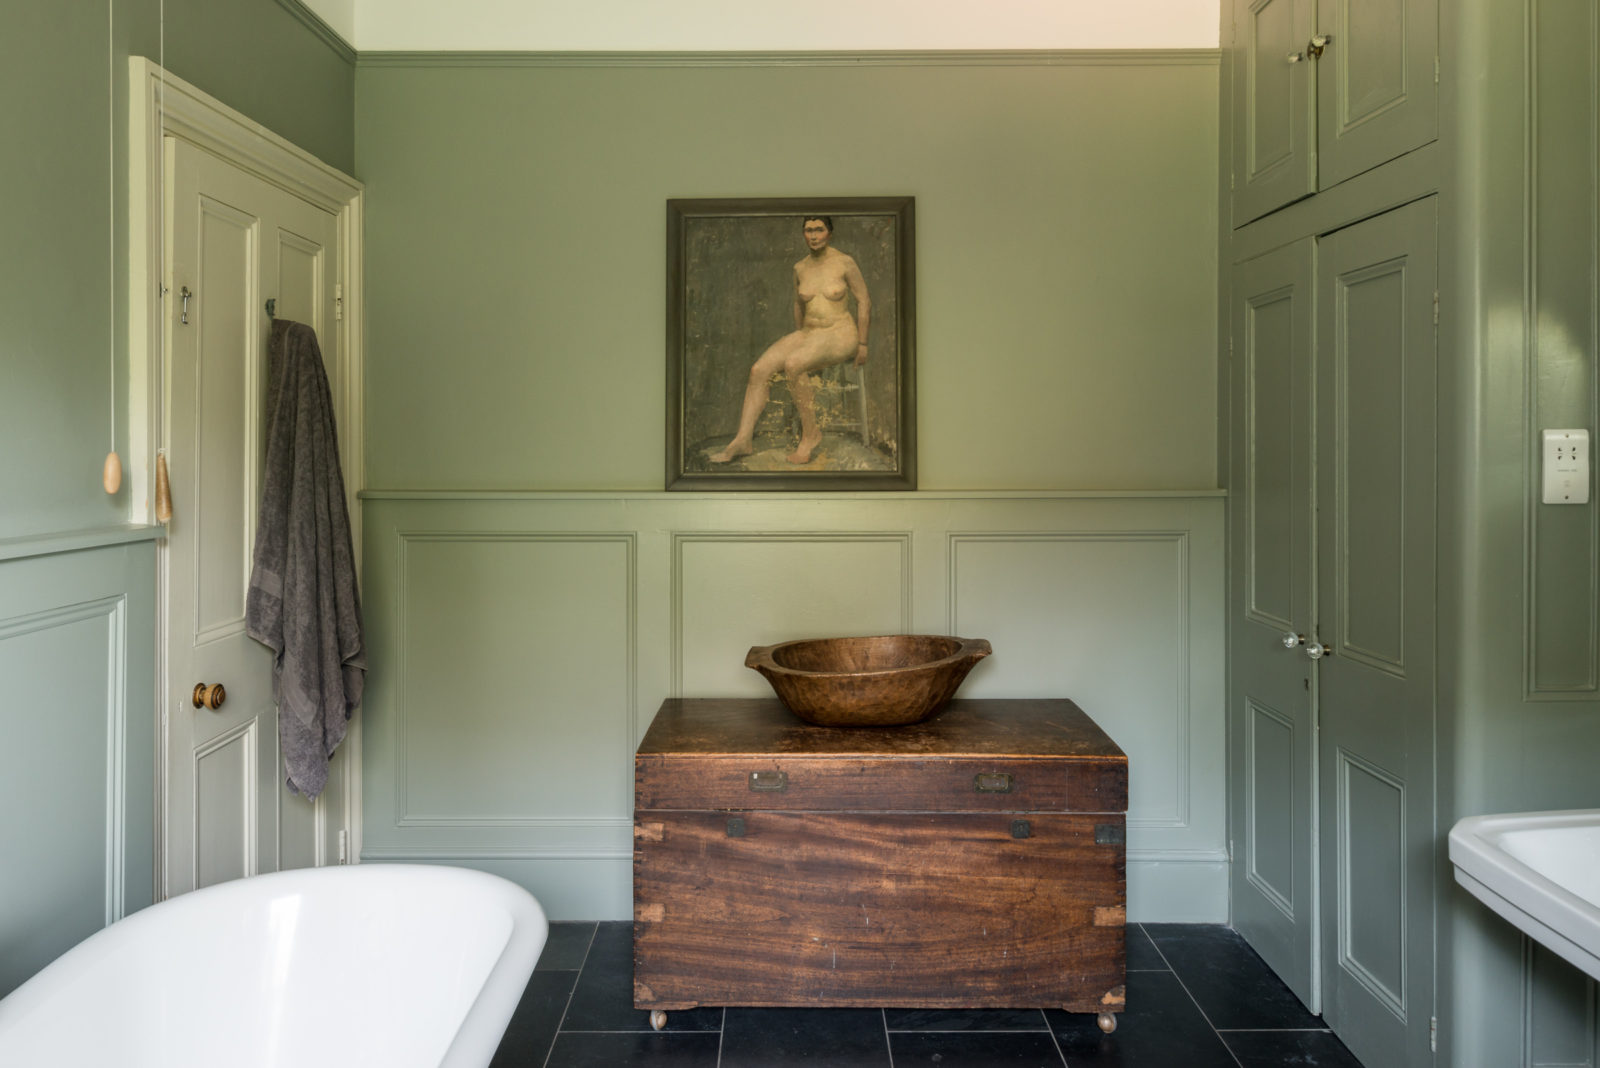 Polyester Badkamer Muur : Karakteristieke landelijke badkamer met mosgroene mureninterieur